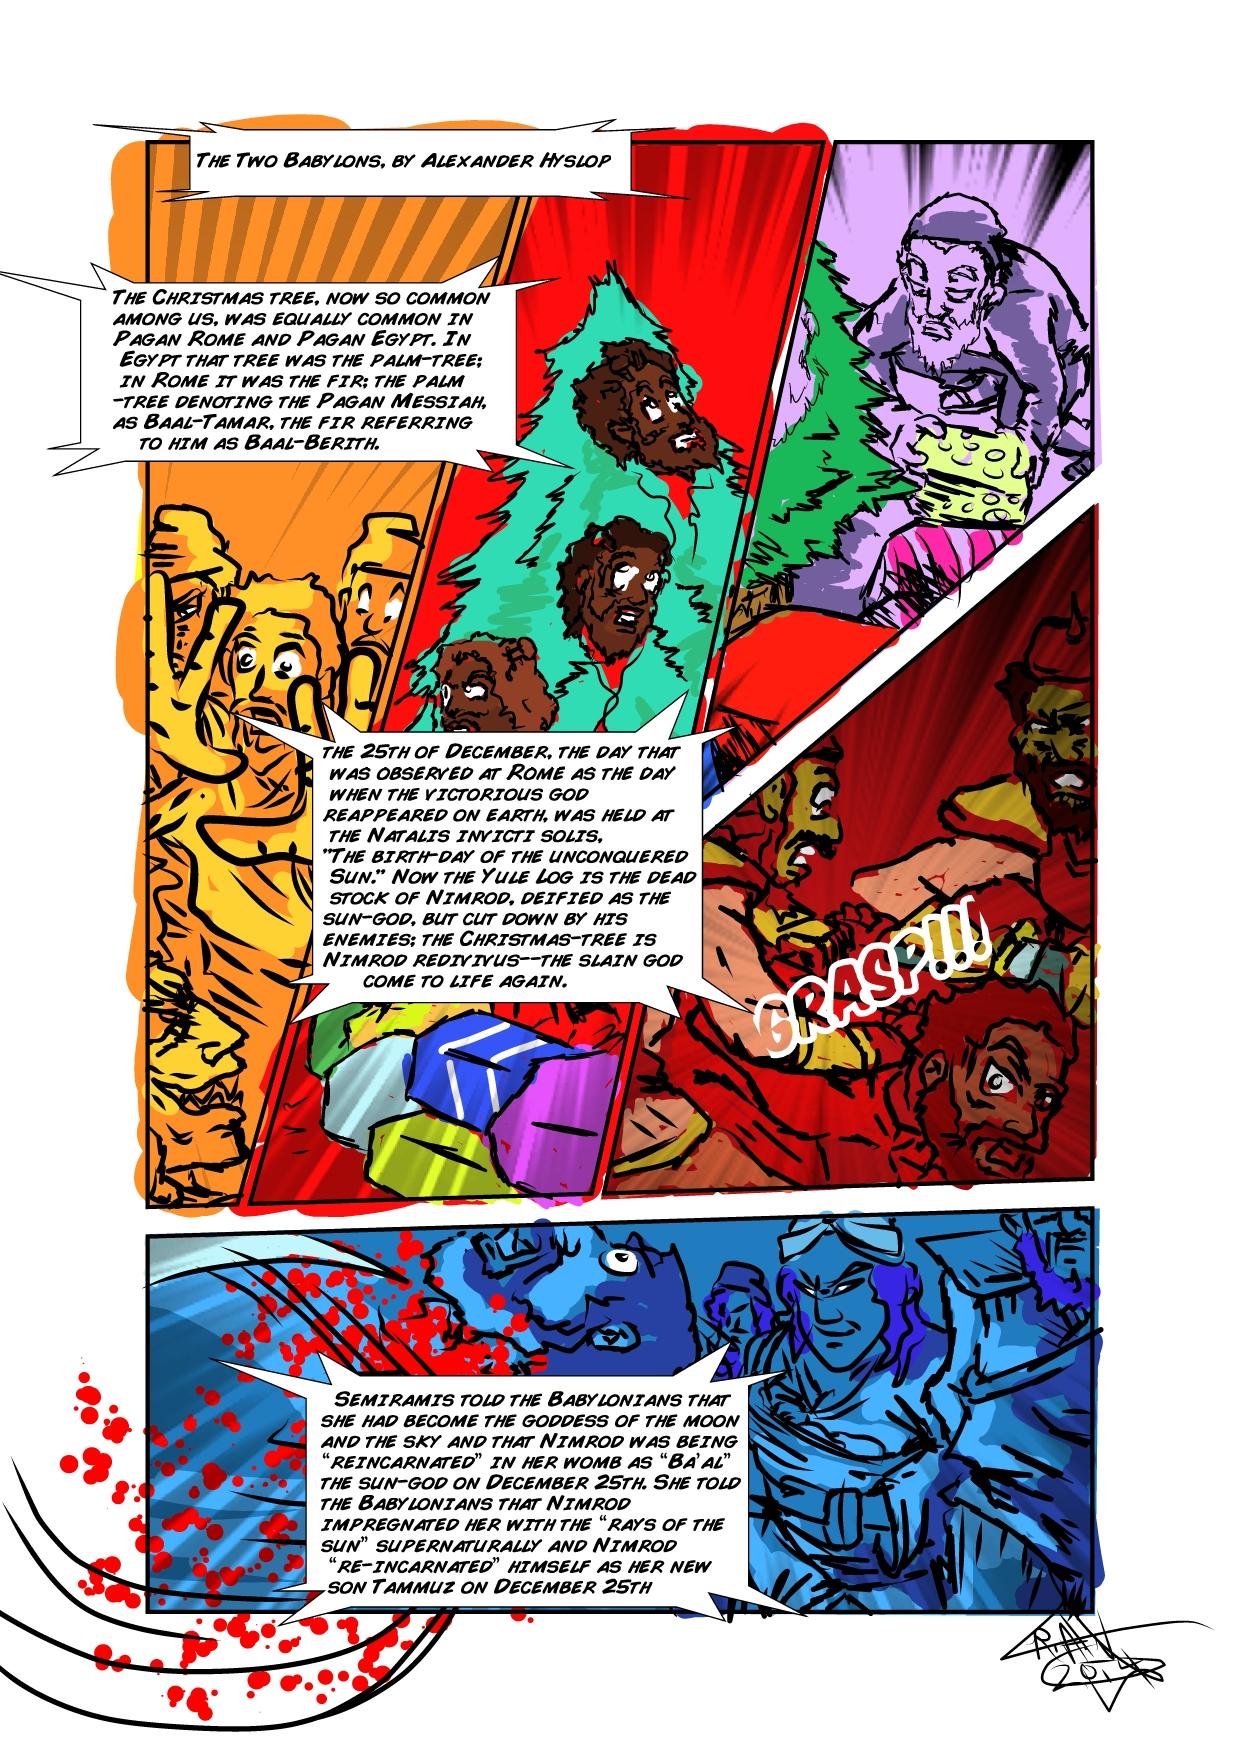 Afroboy (Graphic novel) | RealArtWorkz